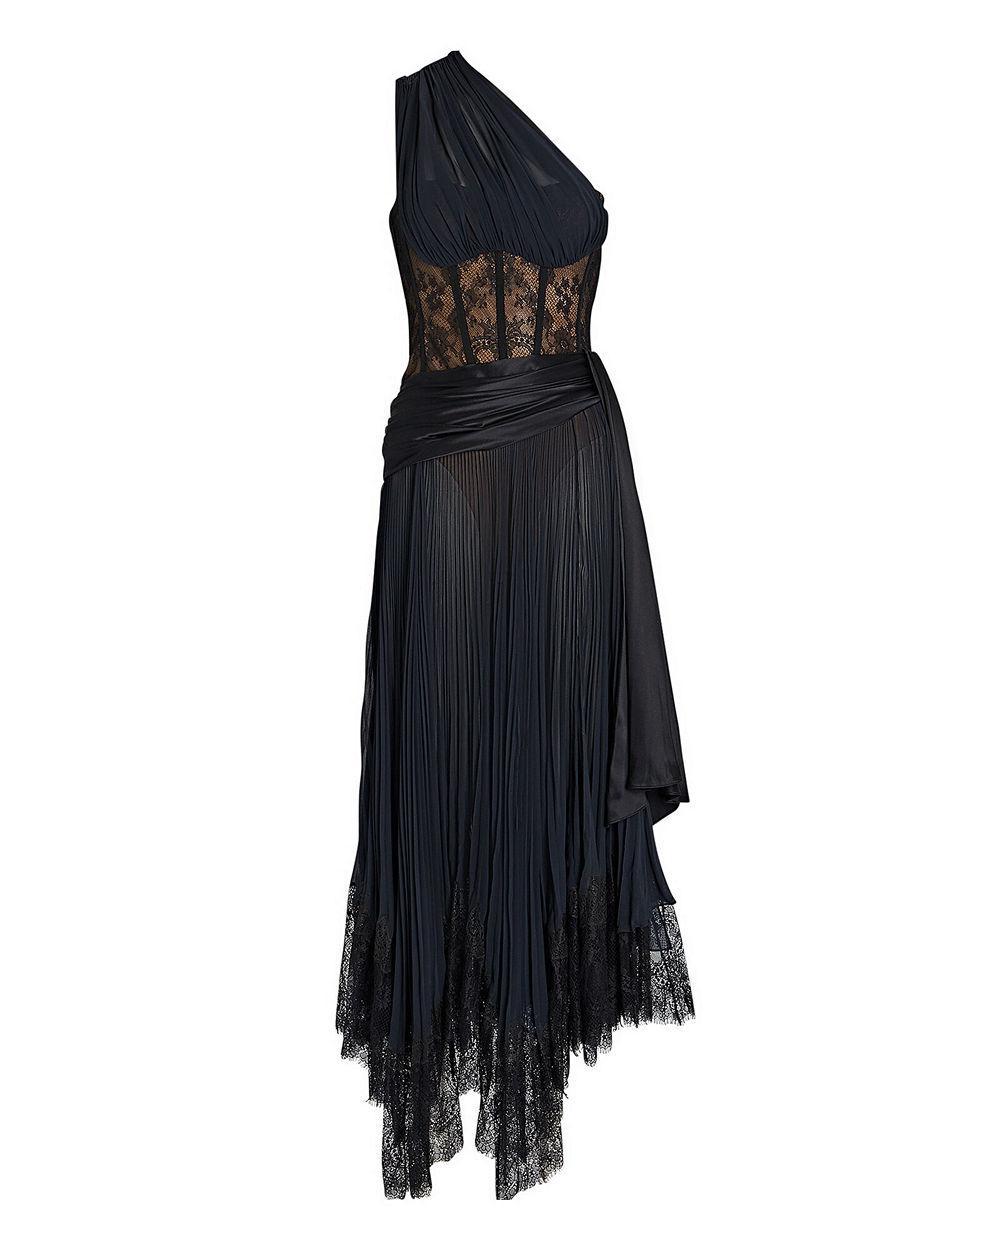 Maude Lingerie Lace Midi Dress Item # 520-1035-E